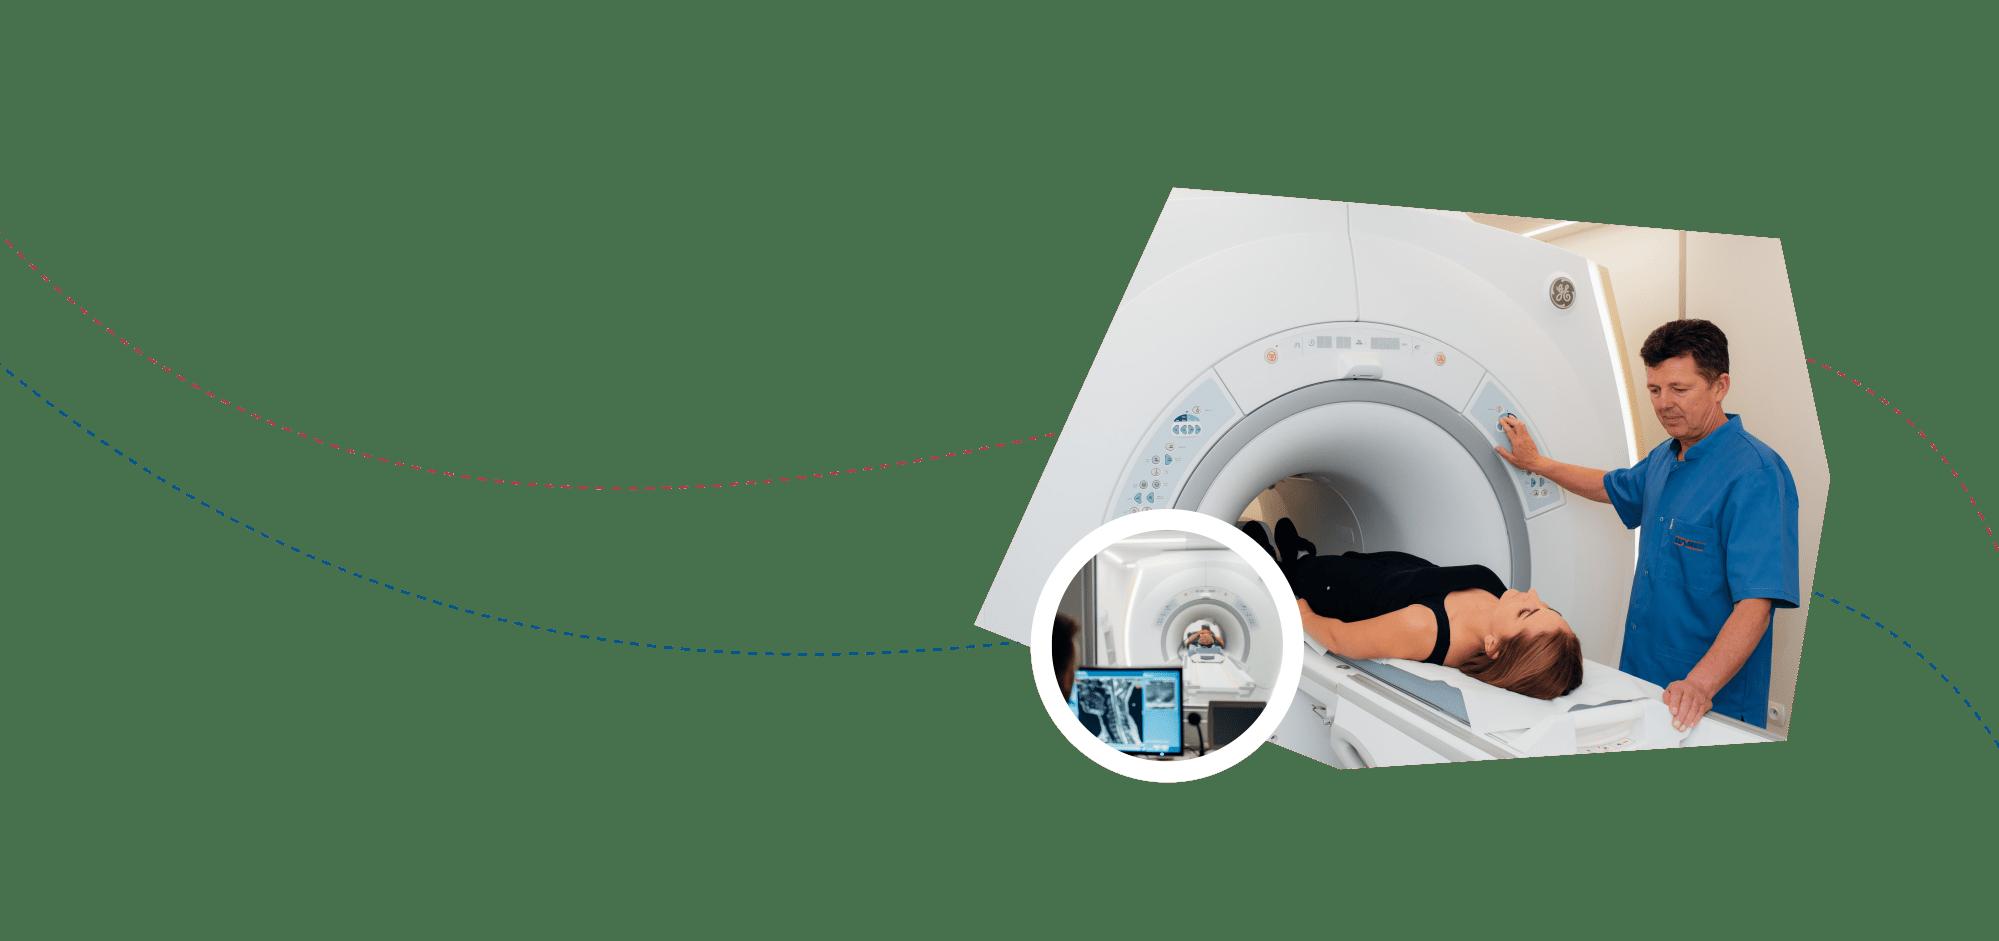 rezonans magnetyczny lublin